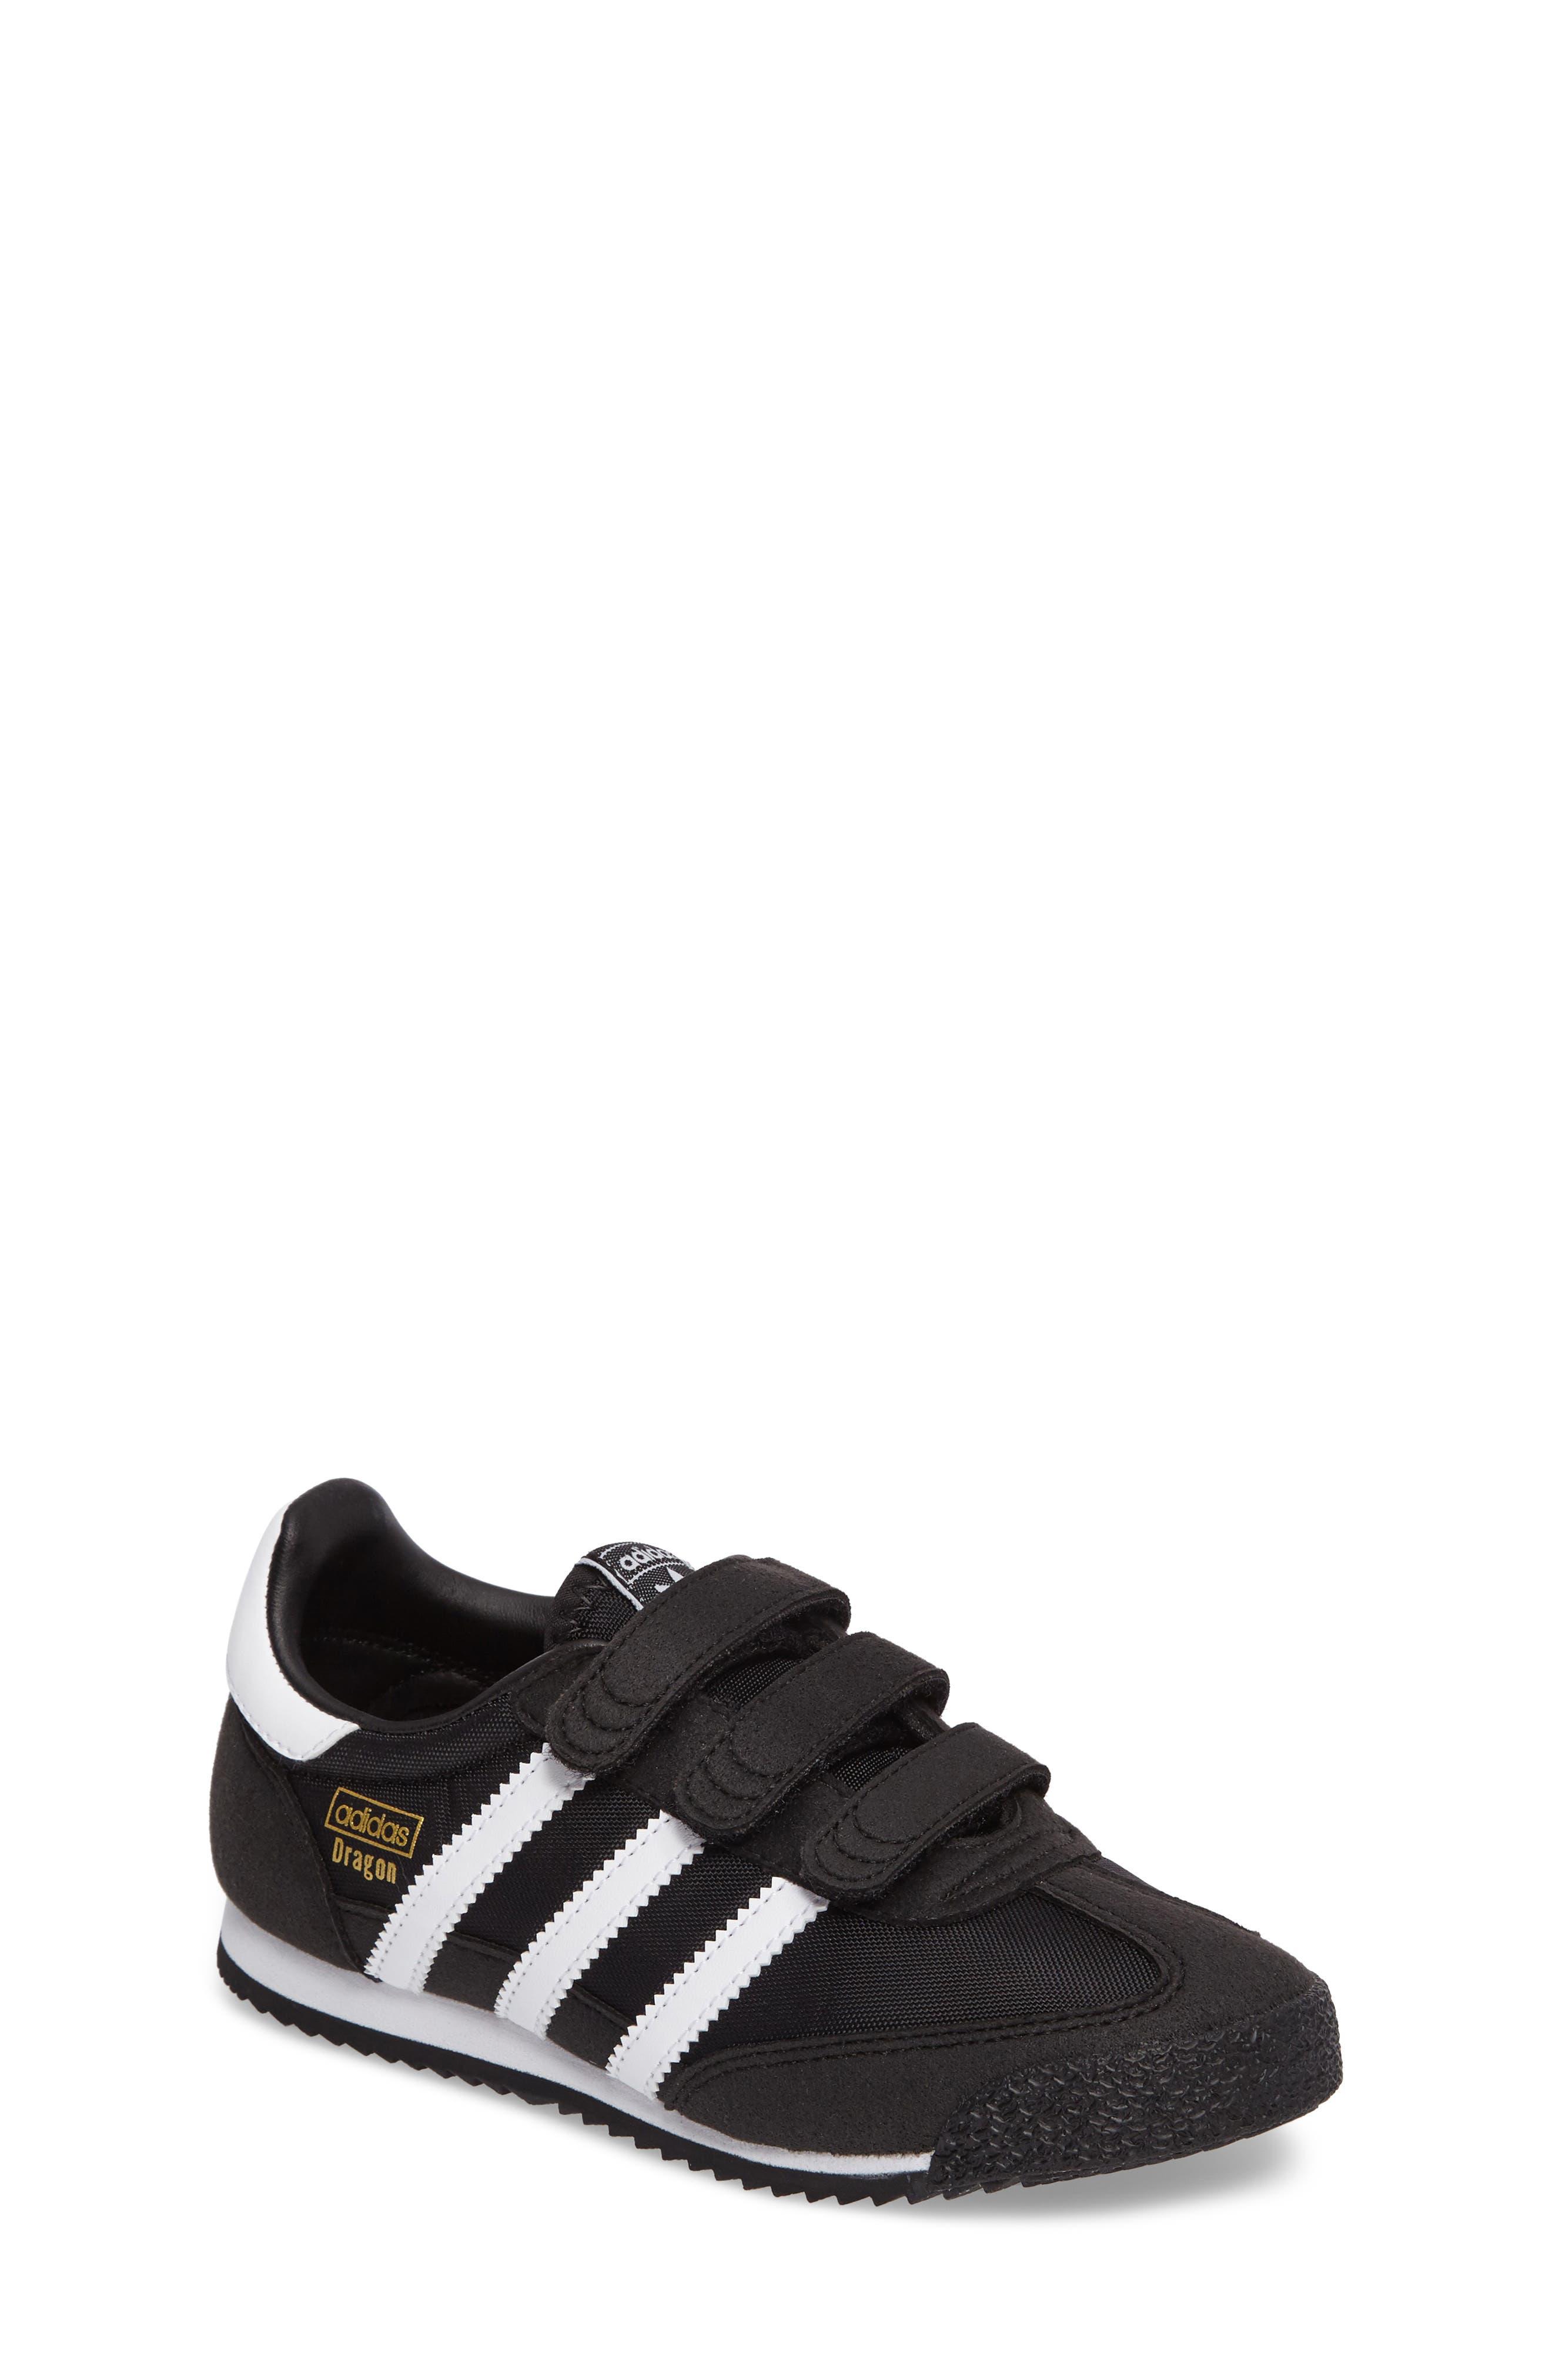 Dragon OG CF Athletic Shoe,                             Main thumbnail 1, color,                             Black/ White